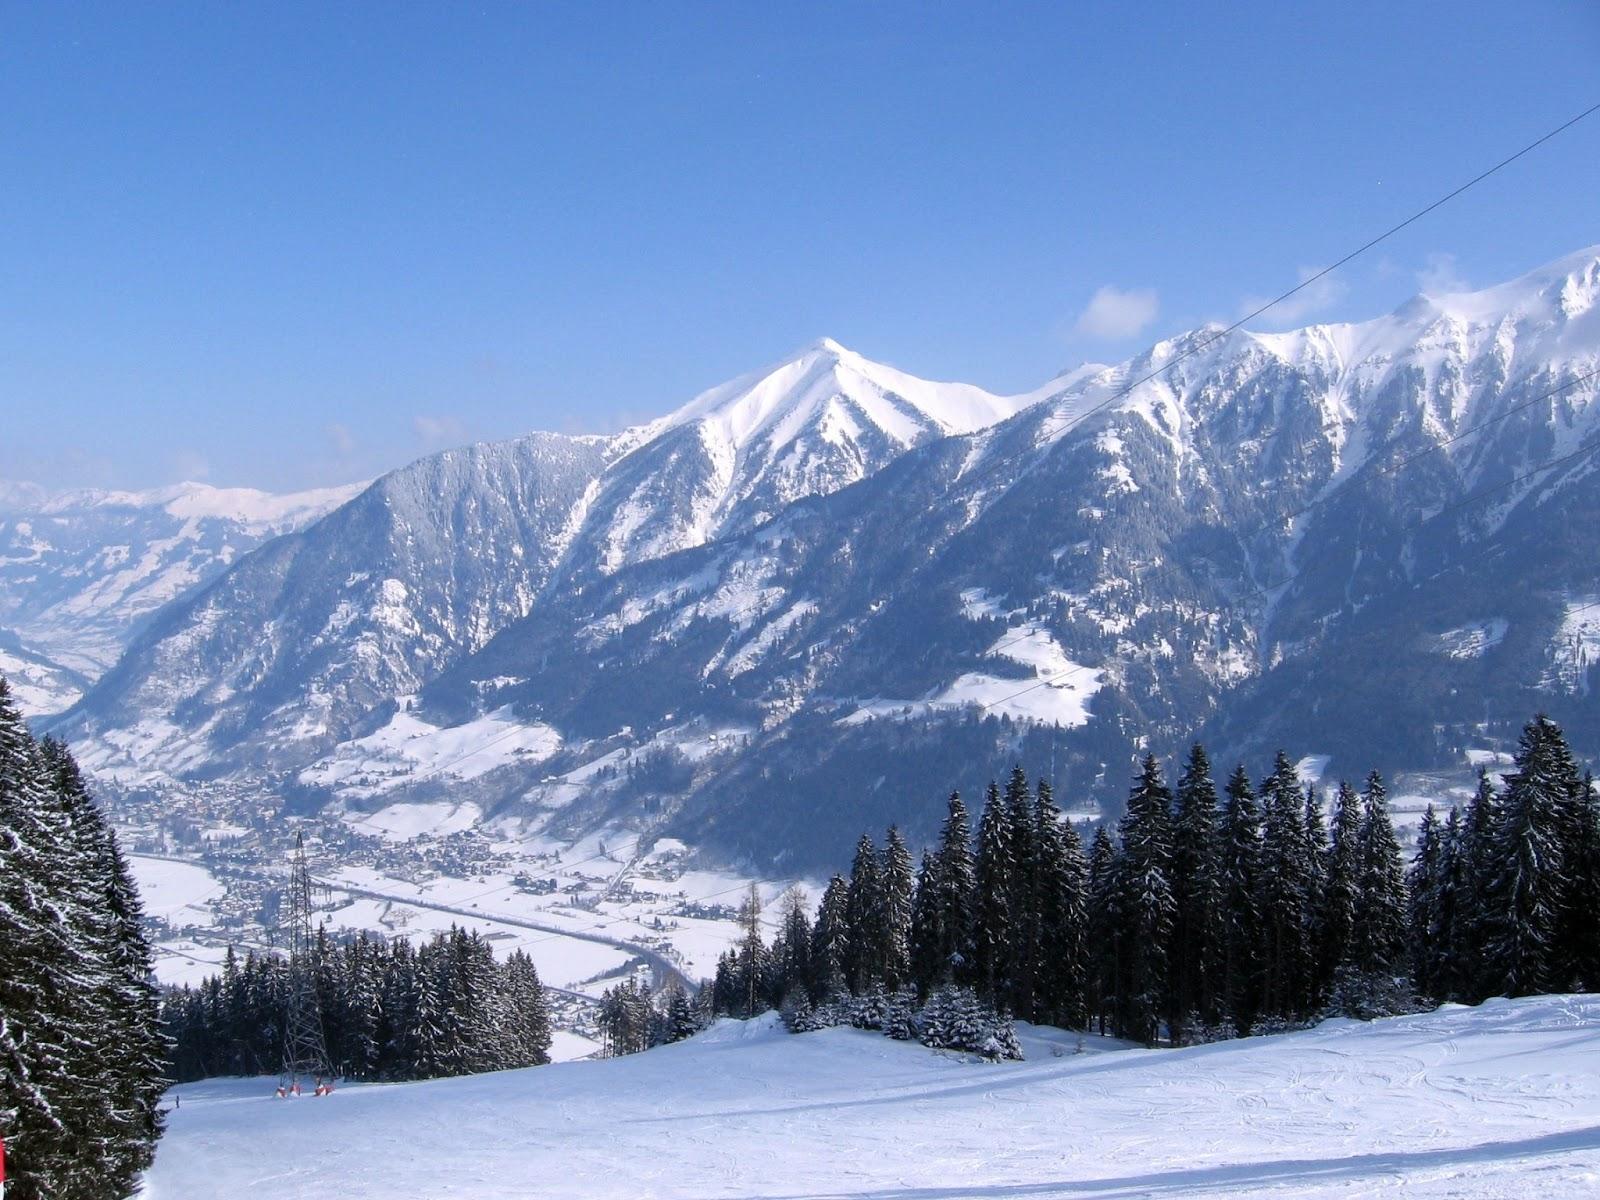 Winter+Desktop+Wallpaper+Mountain.jpg